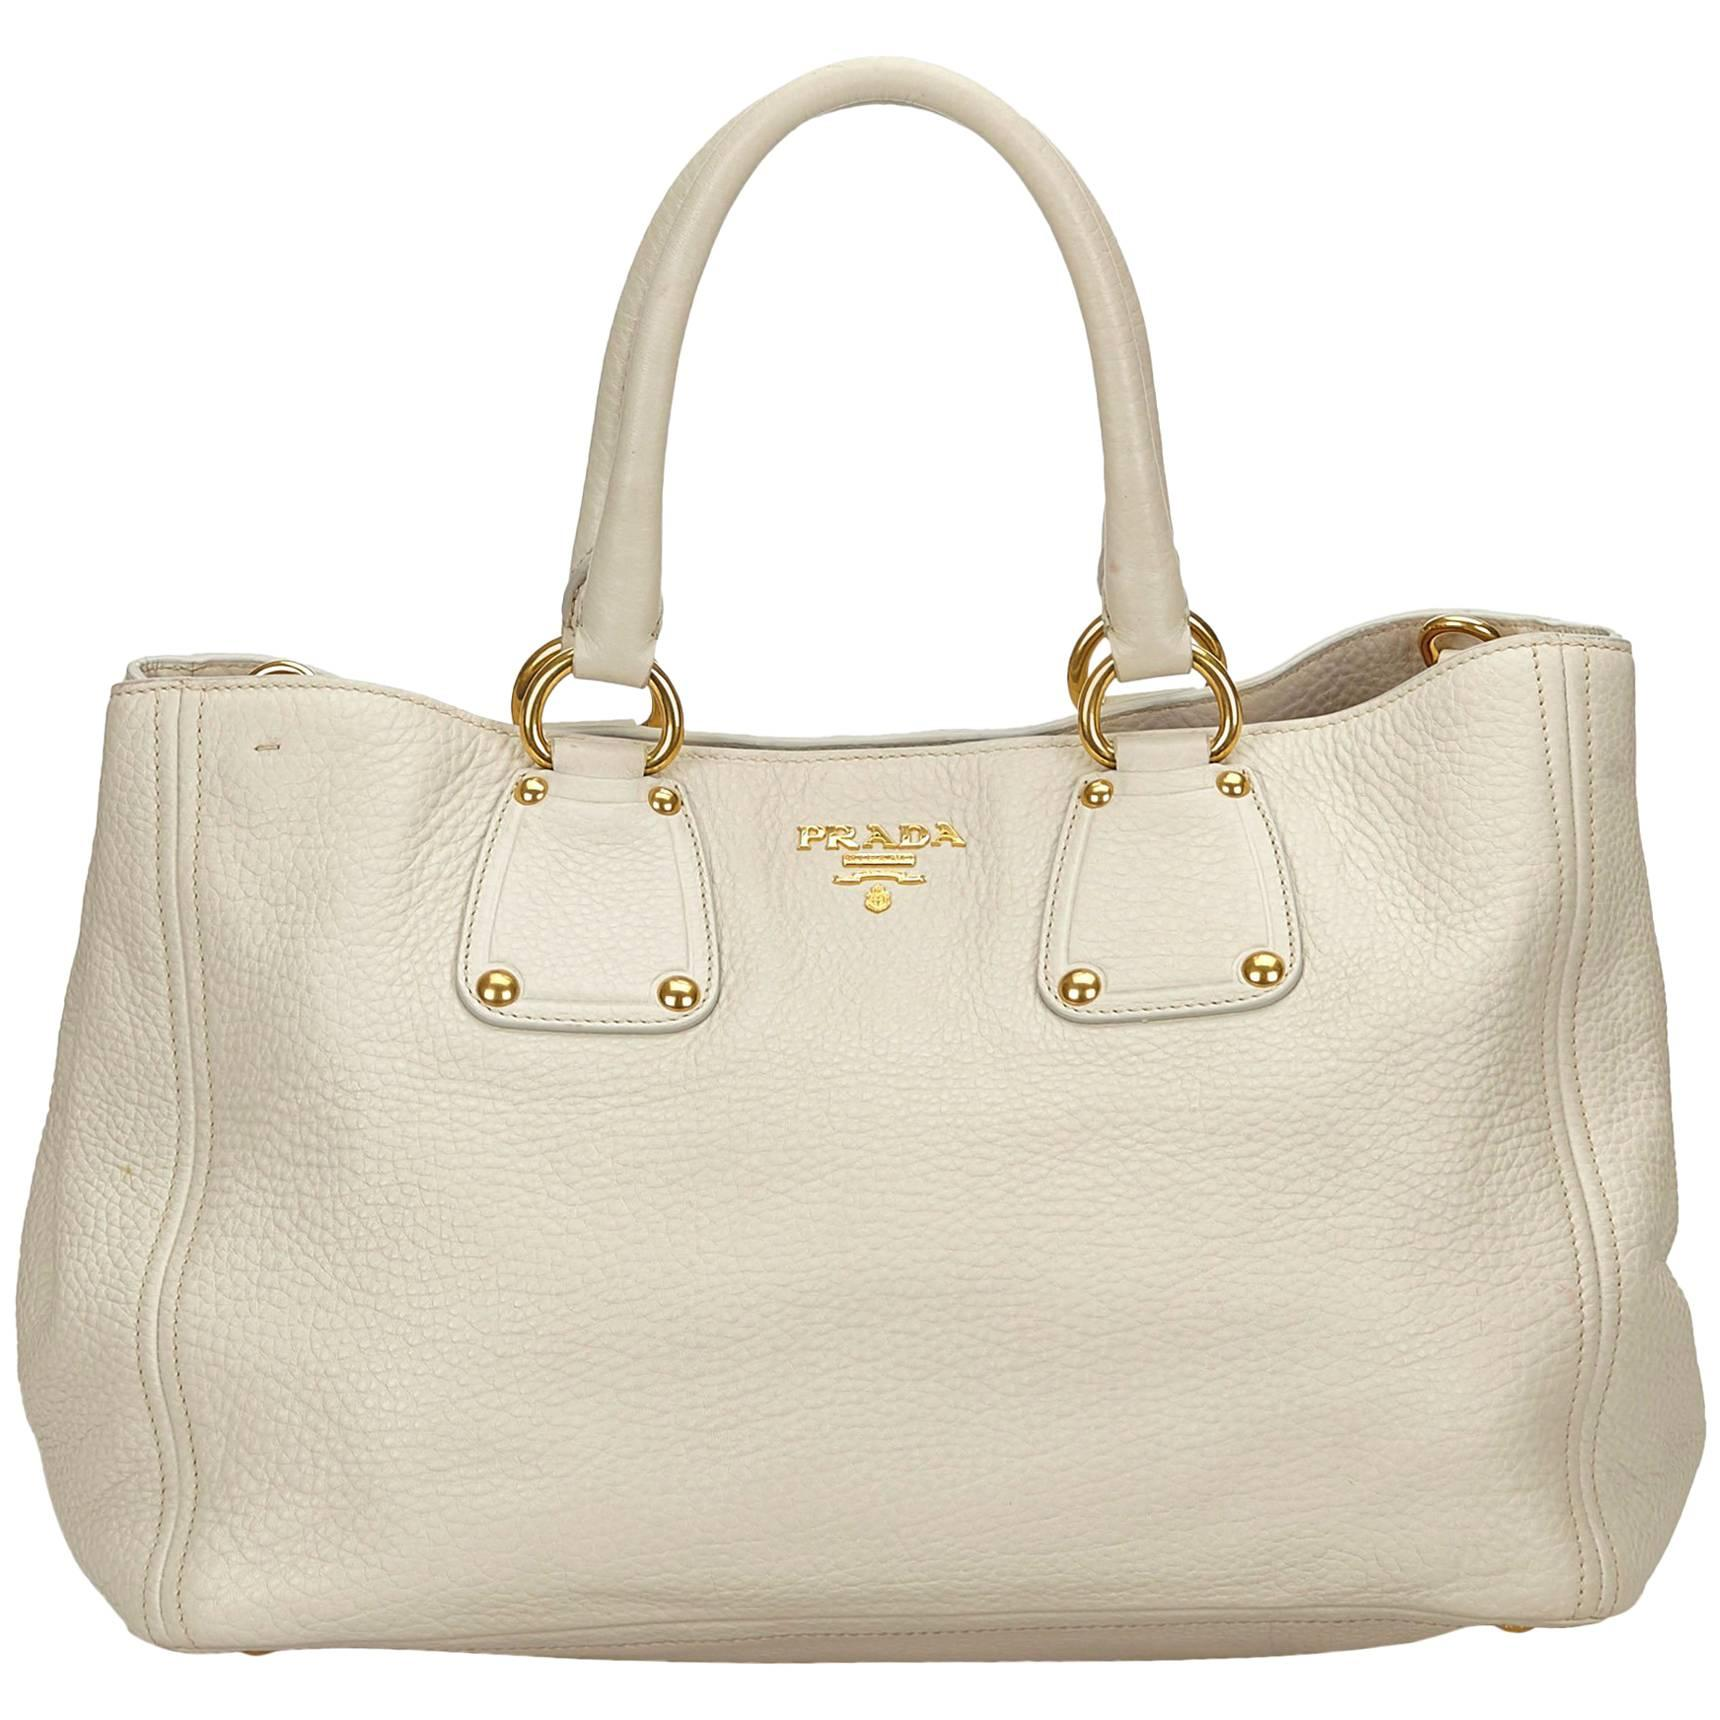 f19f07ded9ff6 ... uk prada white vitello daino leather handbag for sale 7c9aa 0190d